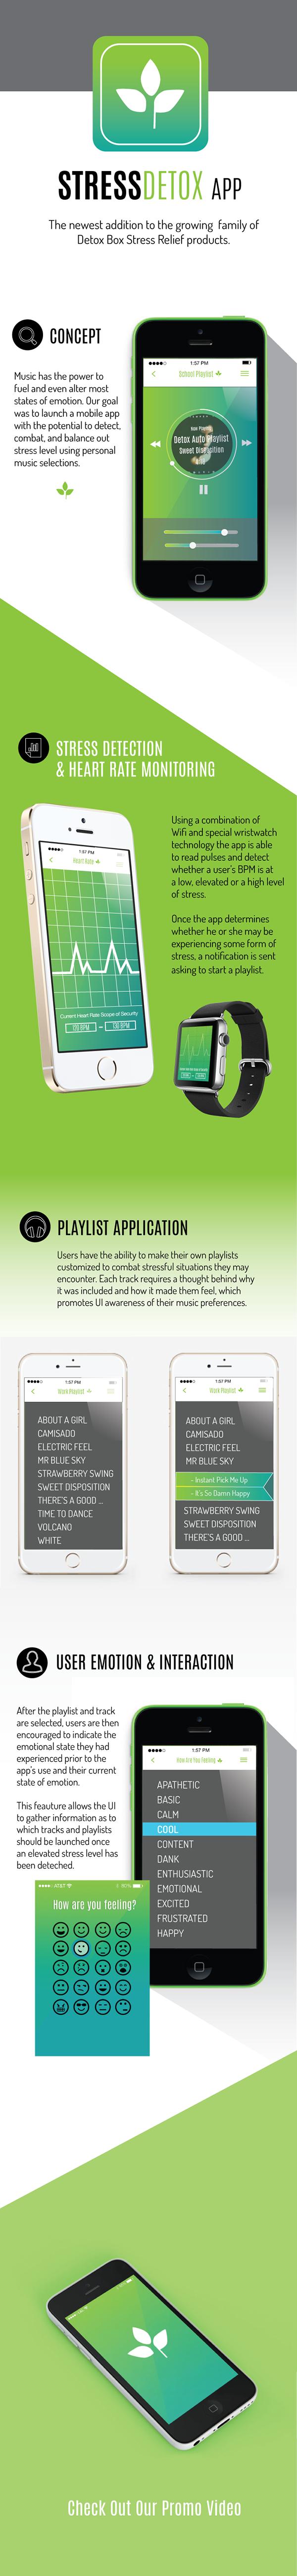 detox app detox box stress relief app stress relief app music app playlist app